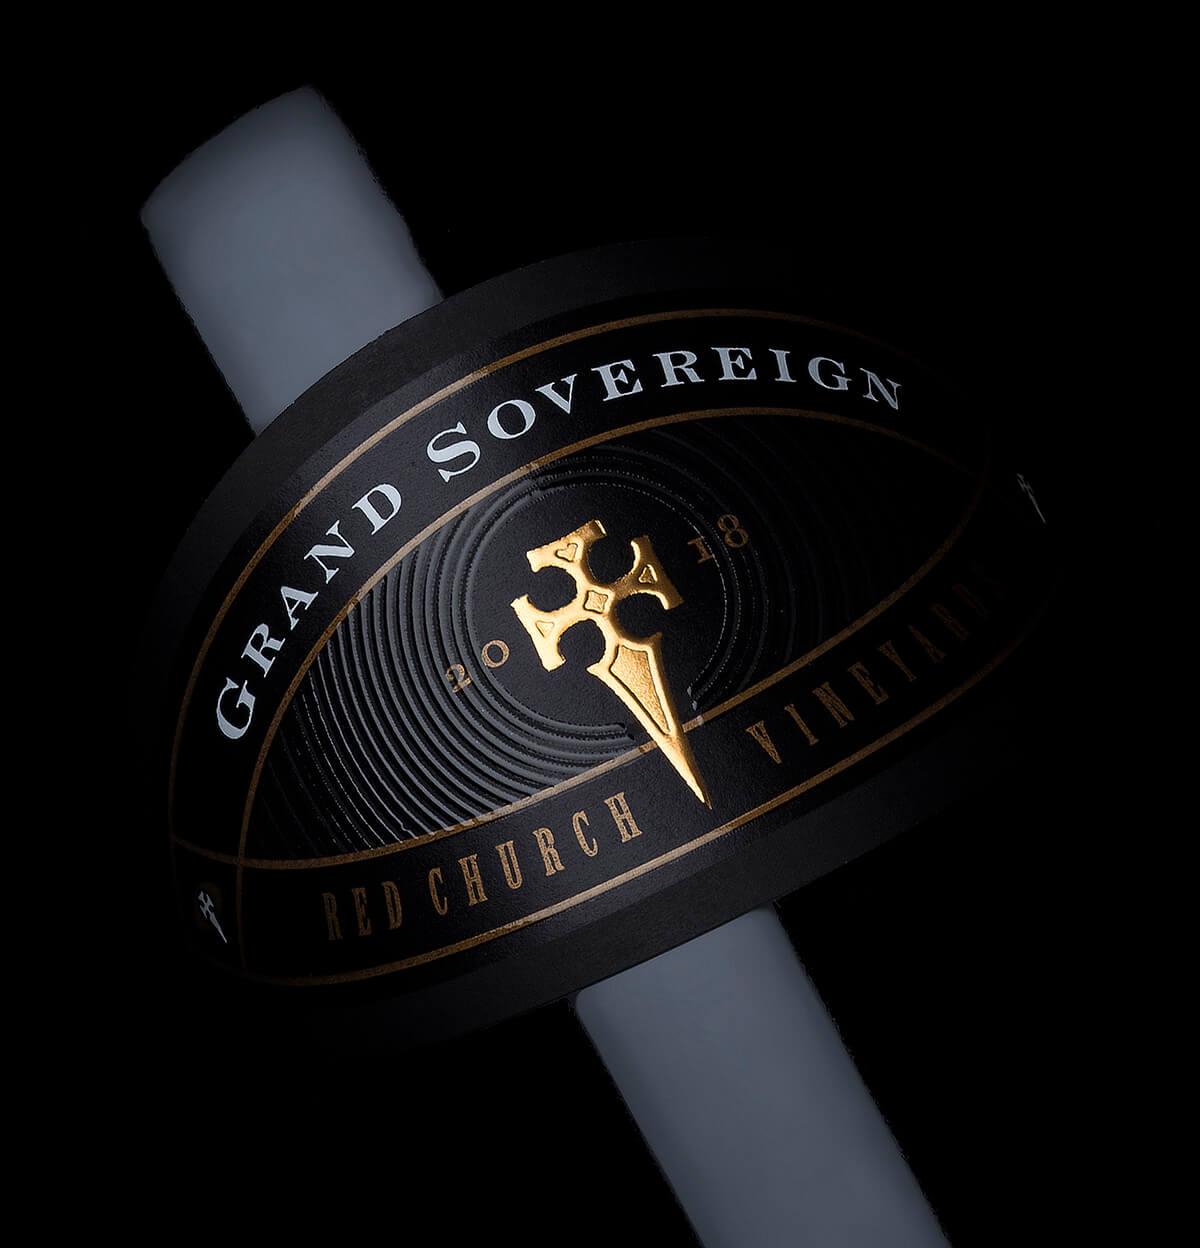 Grand Sovereign